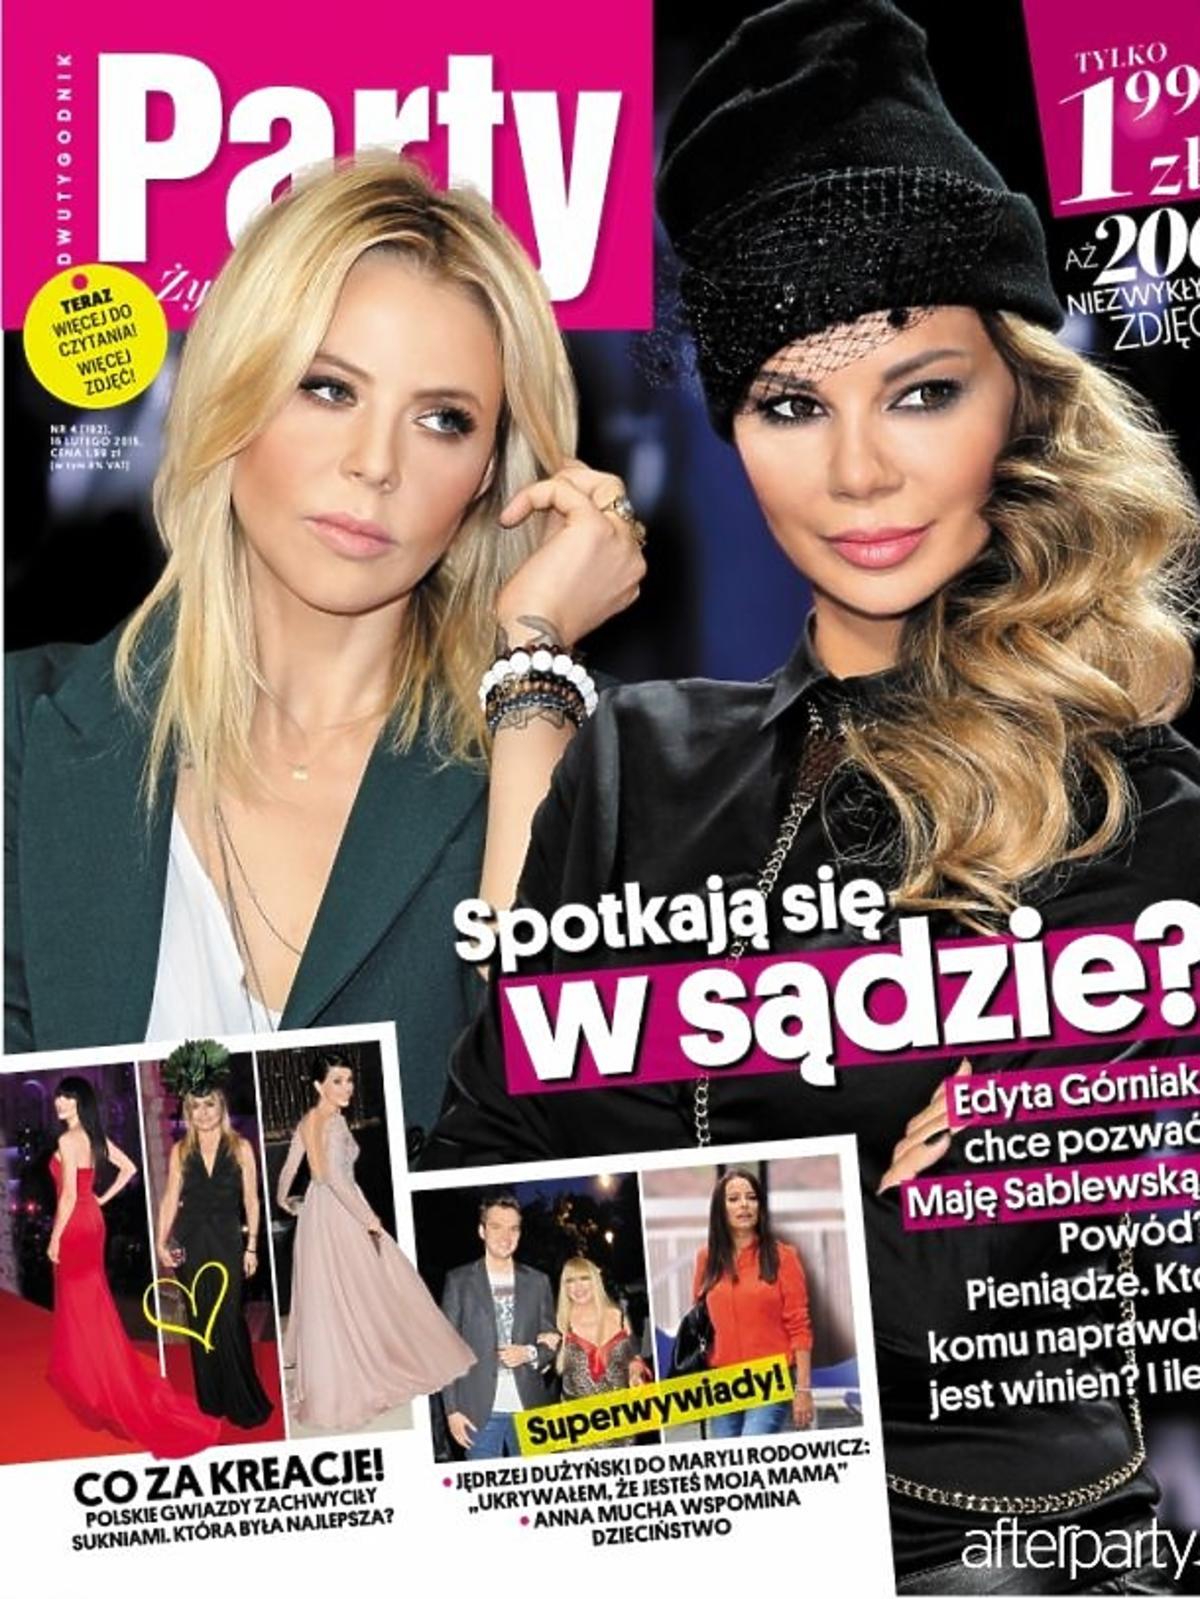 Maja Sablewska i Edyta Górniak  na okładce Party